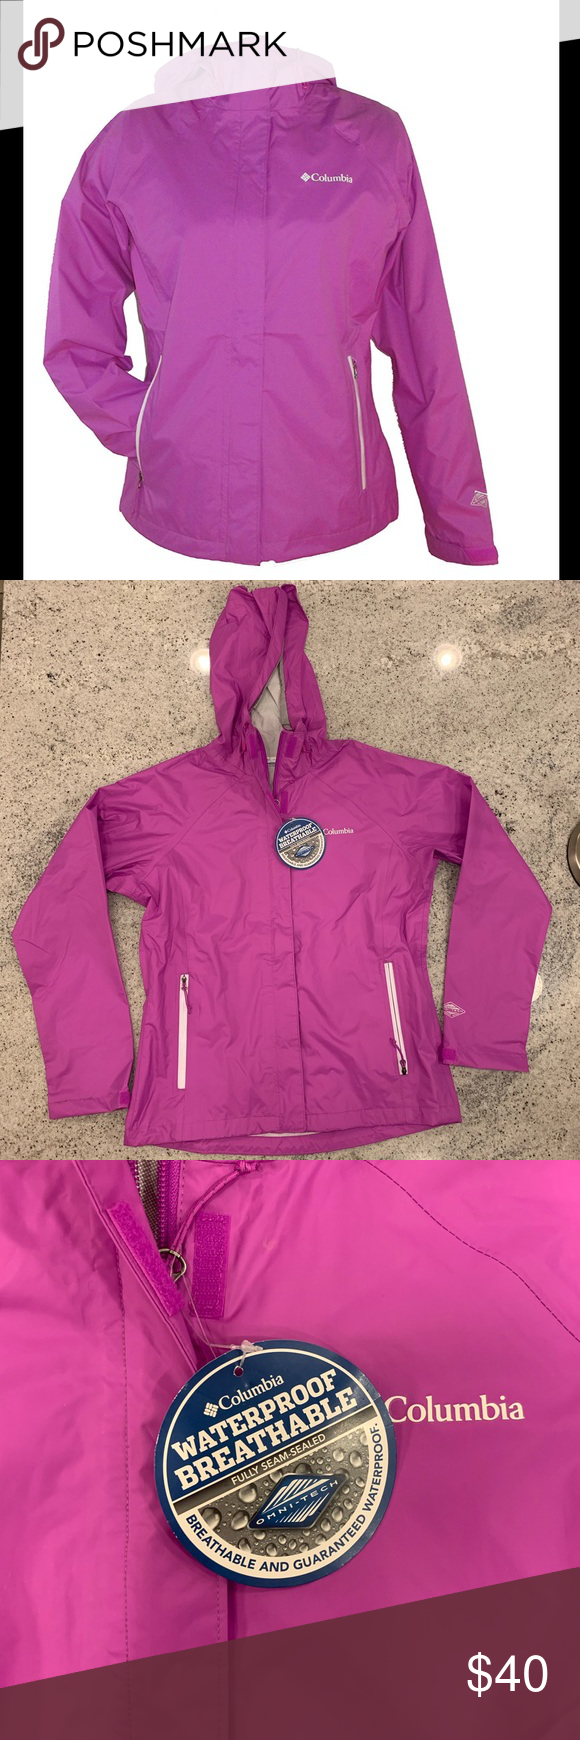 "New Womens Columbia /""Gable Pass/"" Omni-Tech Waterproof Hooded Rain Jacket"